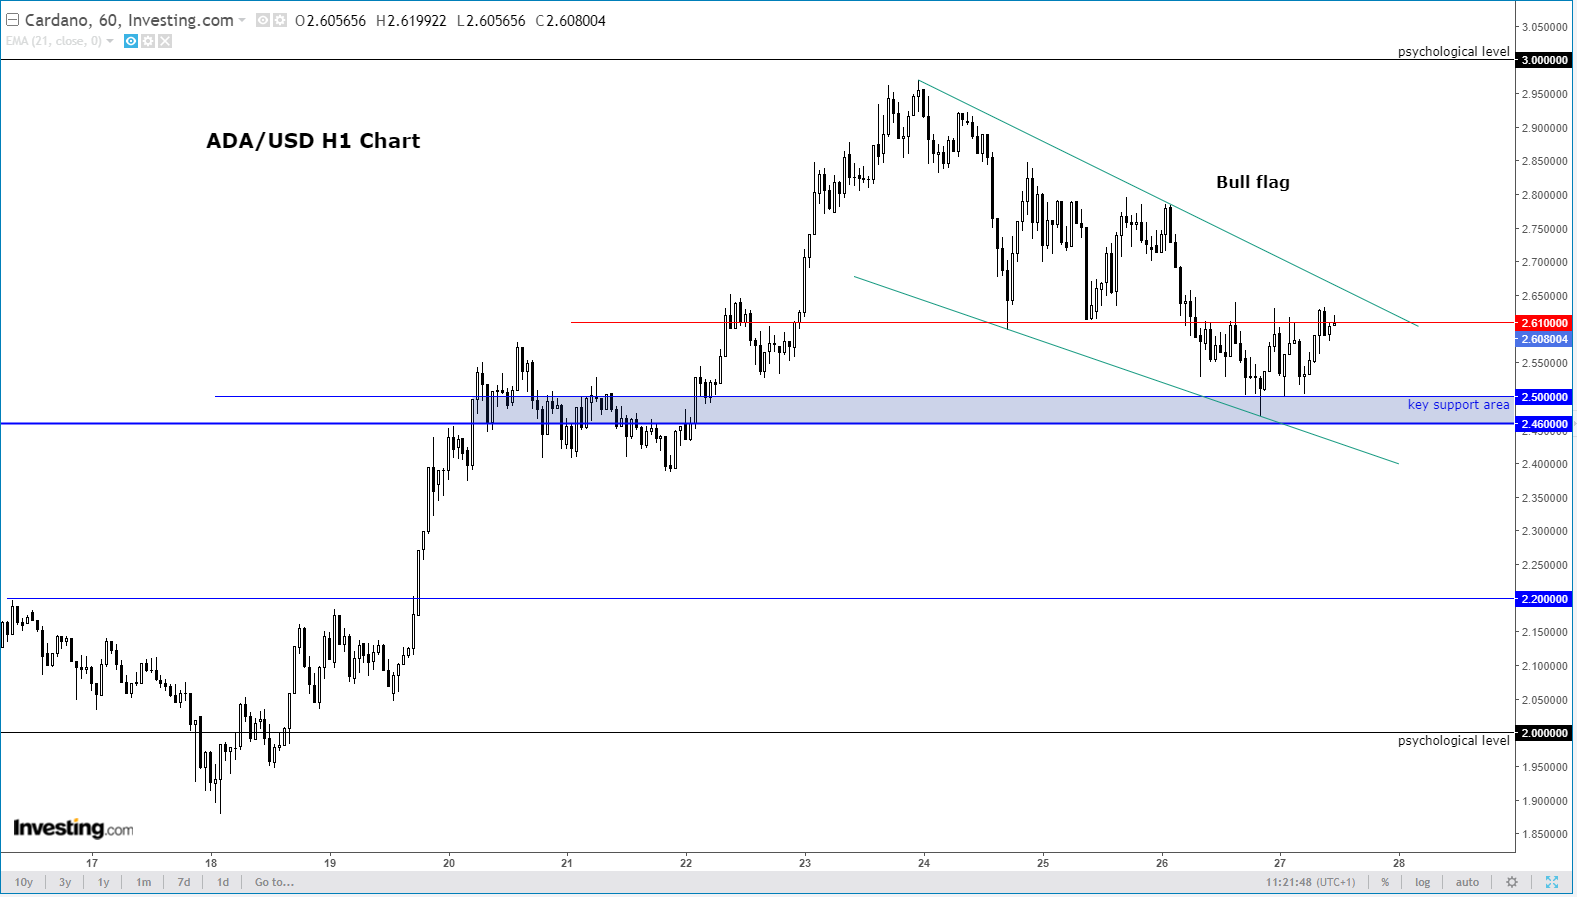 ADA/USD H1 Chart